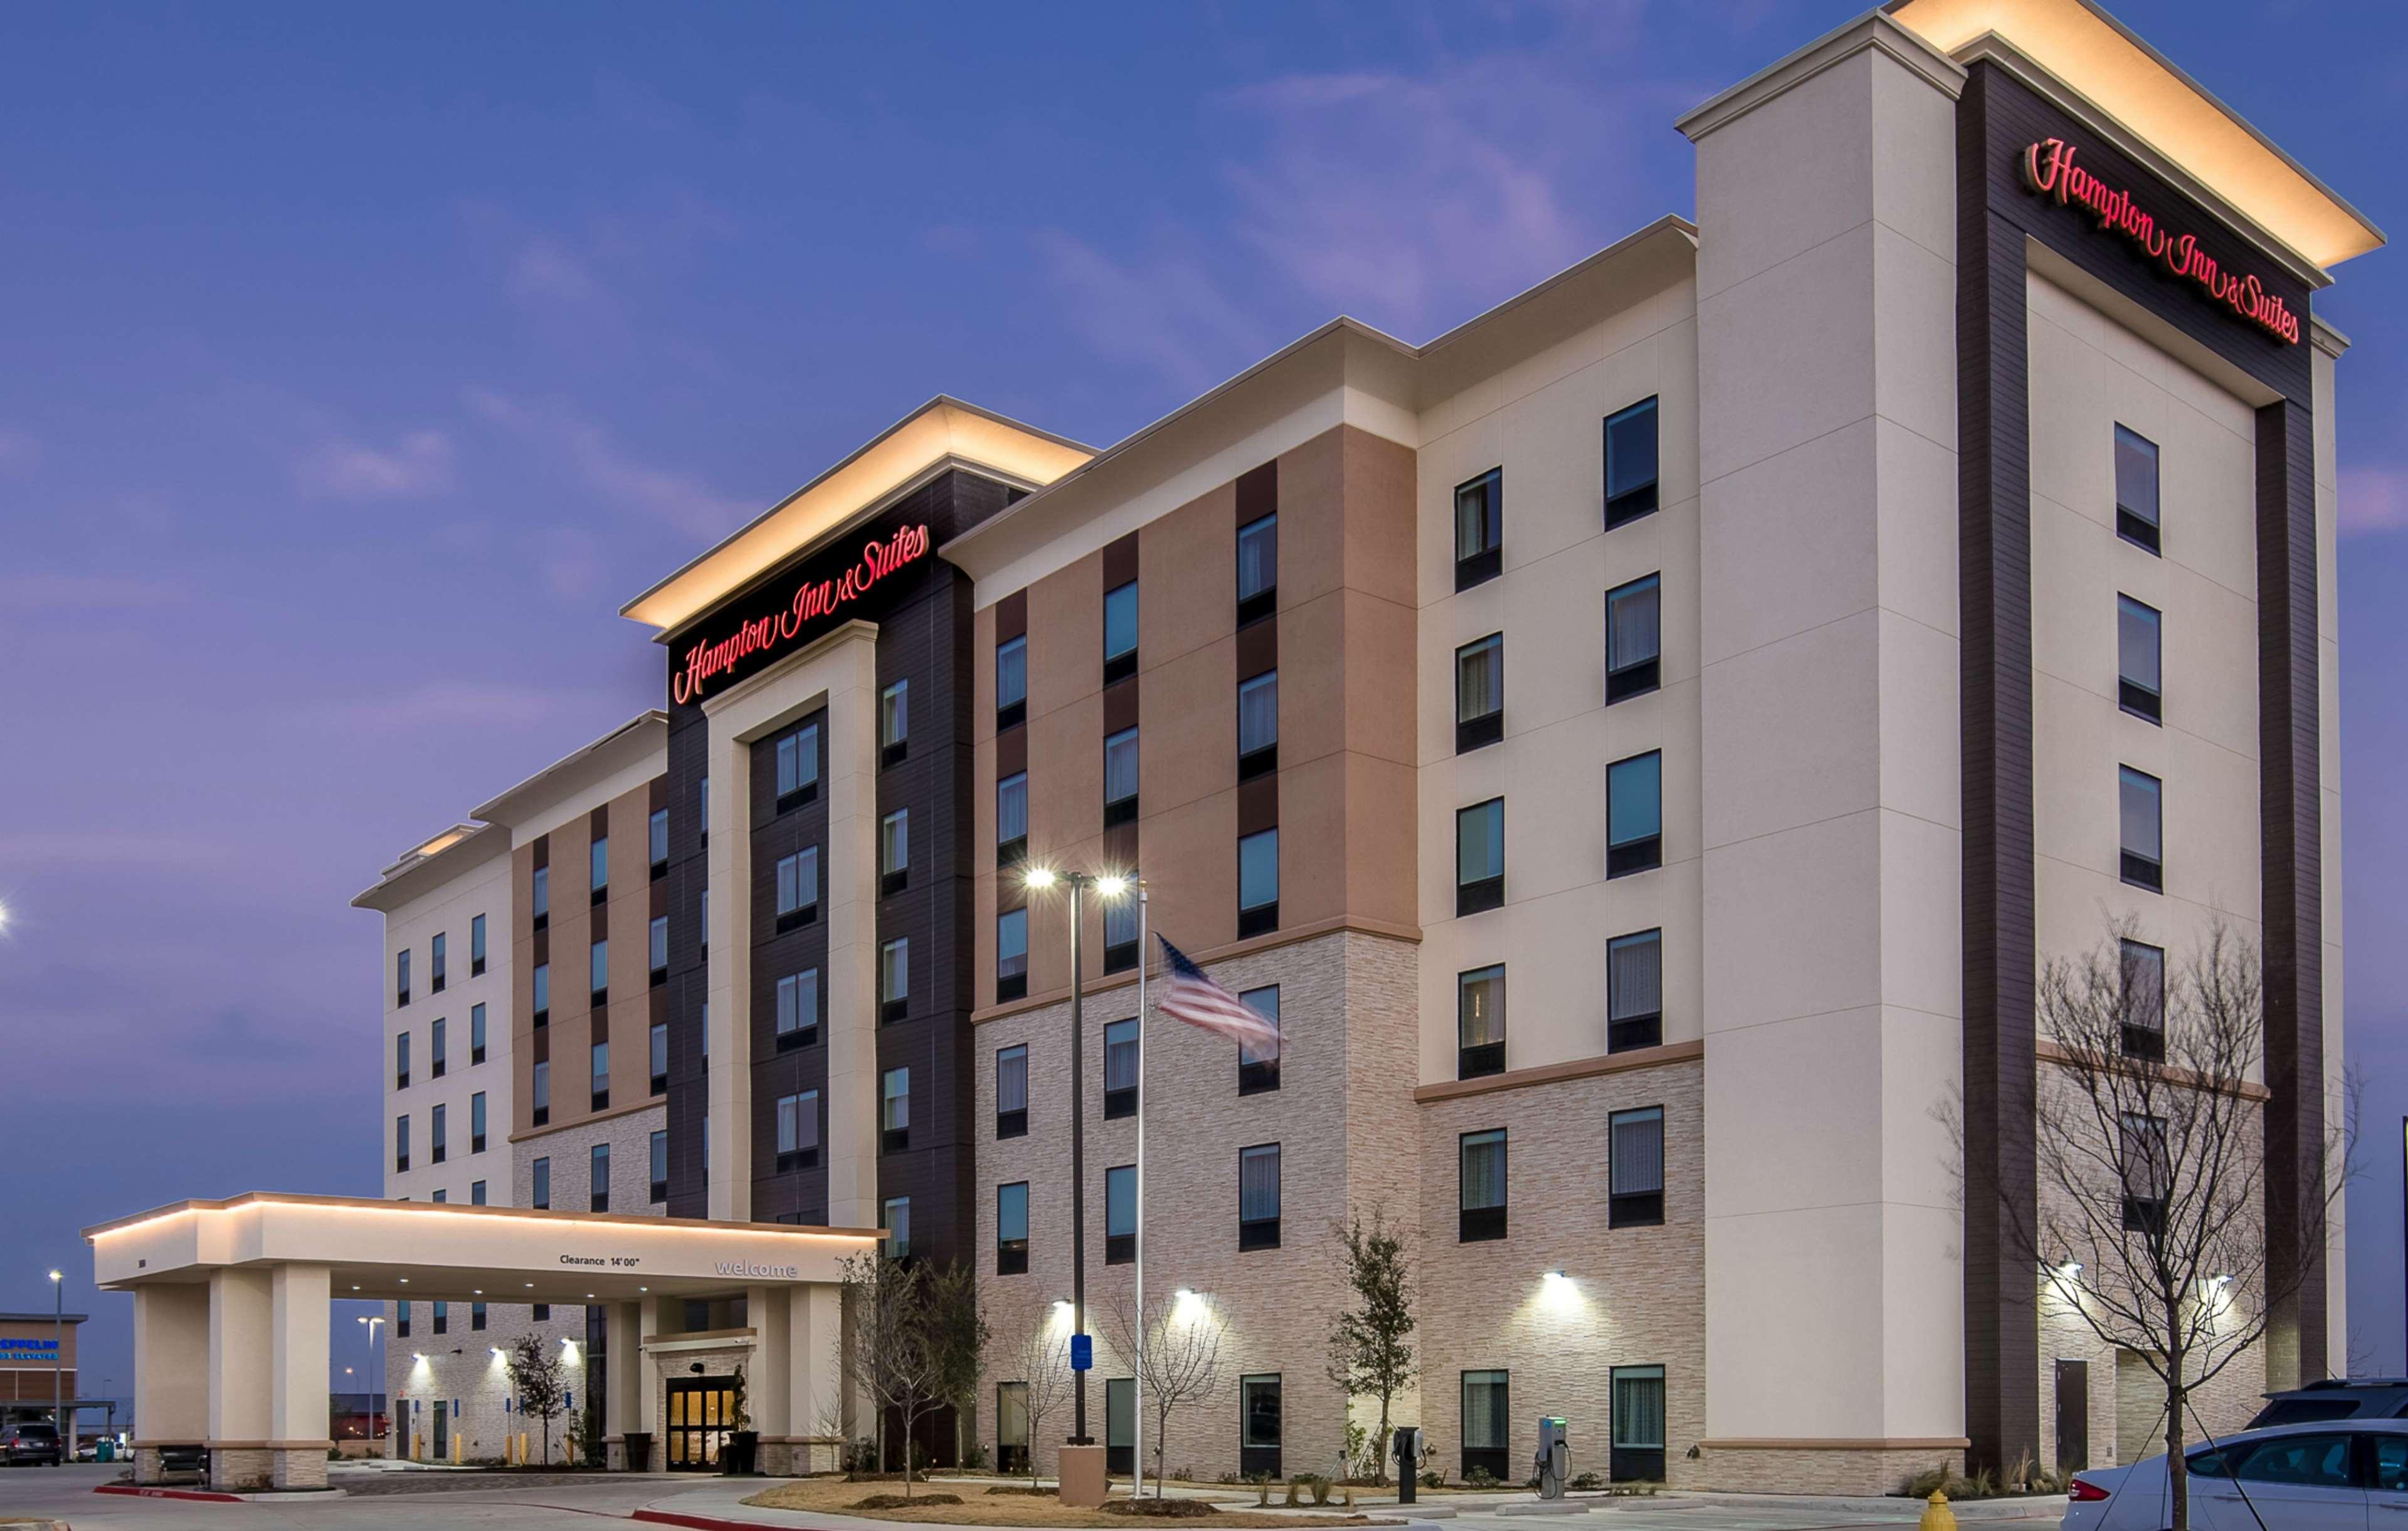 Hampton Inn & Suites Dallas-The Colony, TX image 1